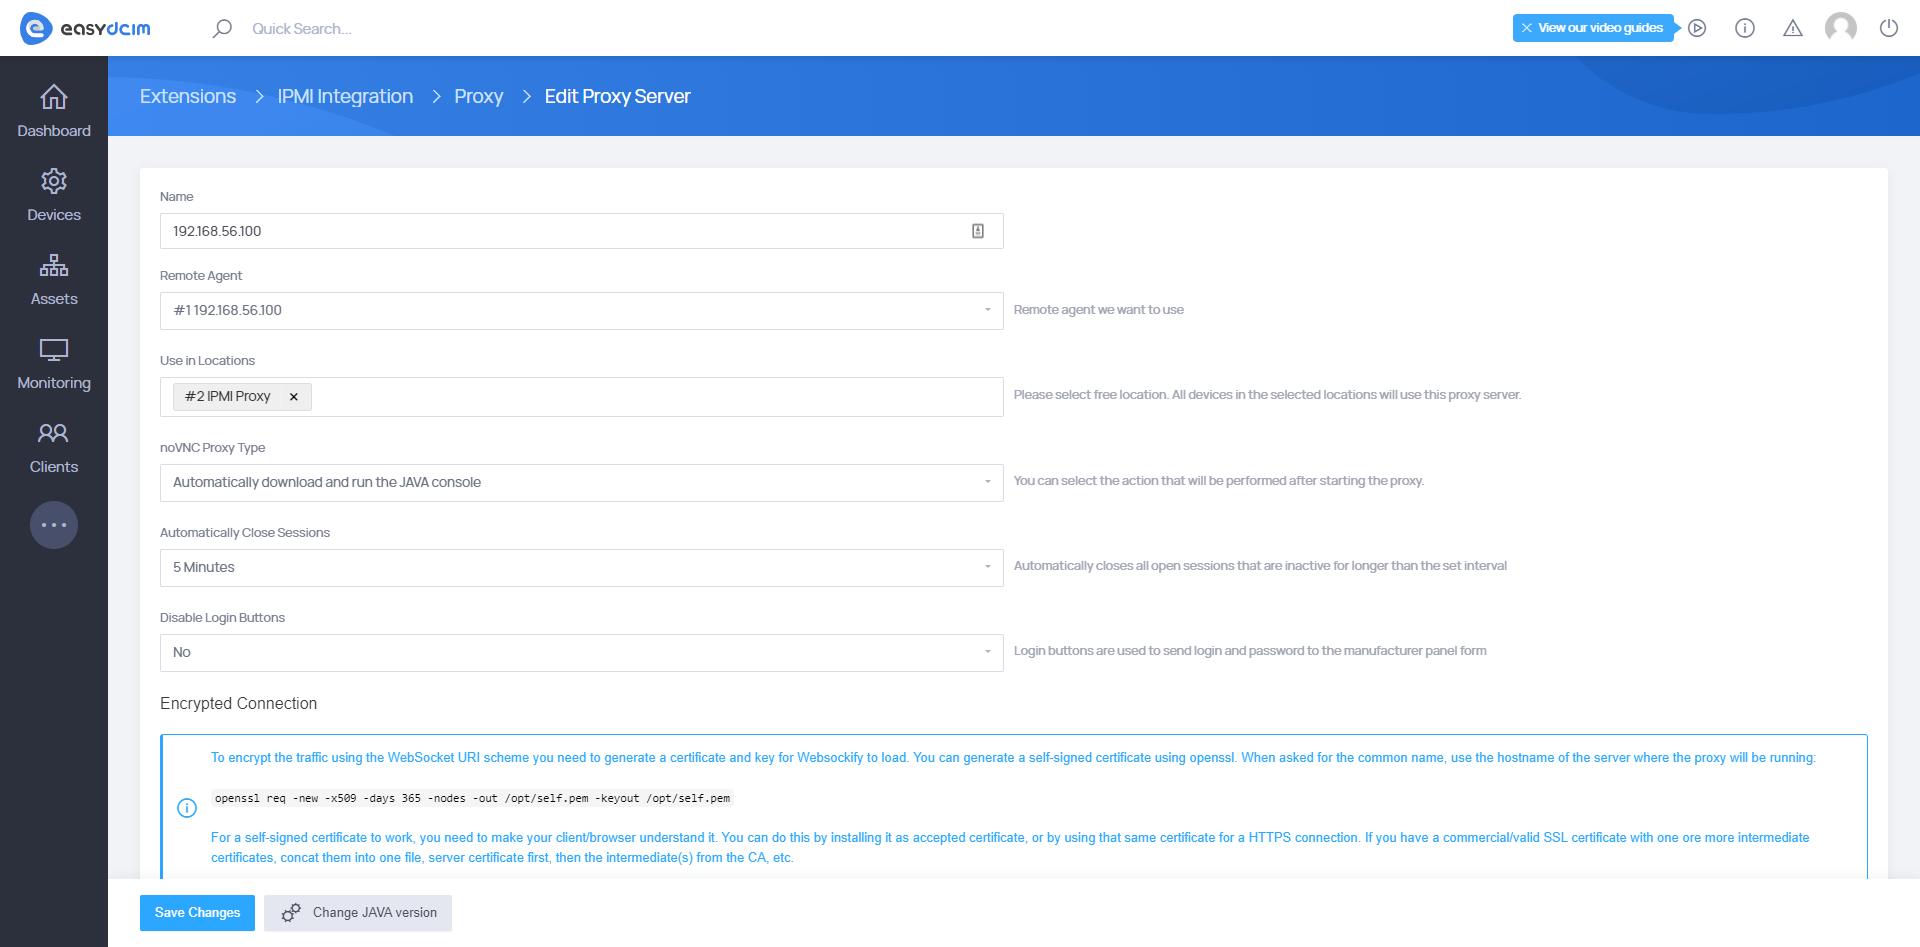 IPMI Proxy Server Management - IPMI Integration Extension - EasyDCIM v1.7.4